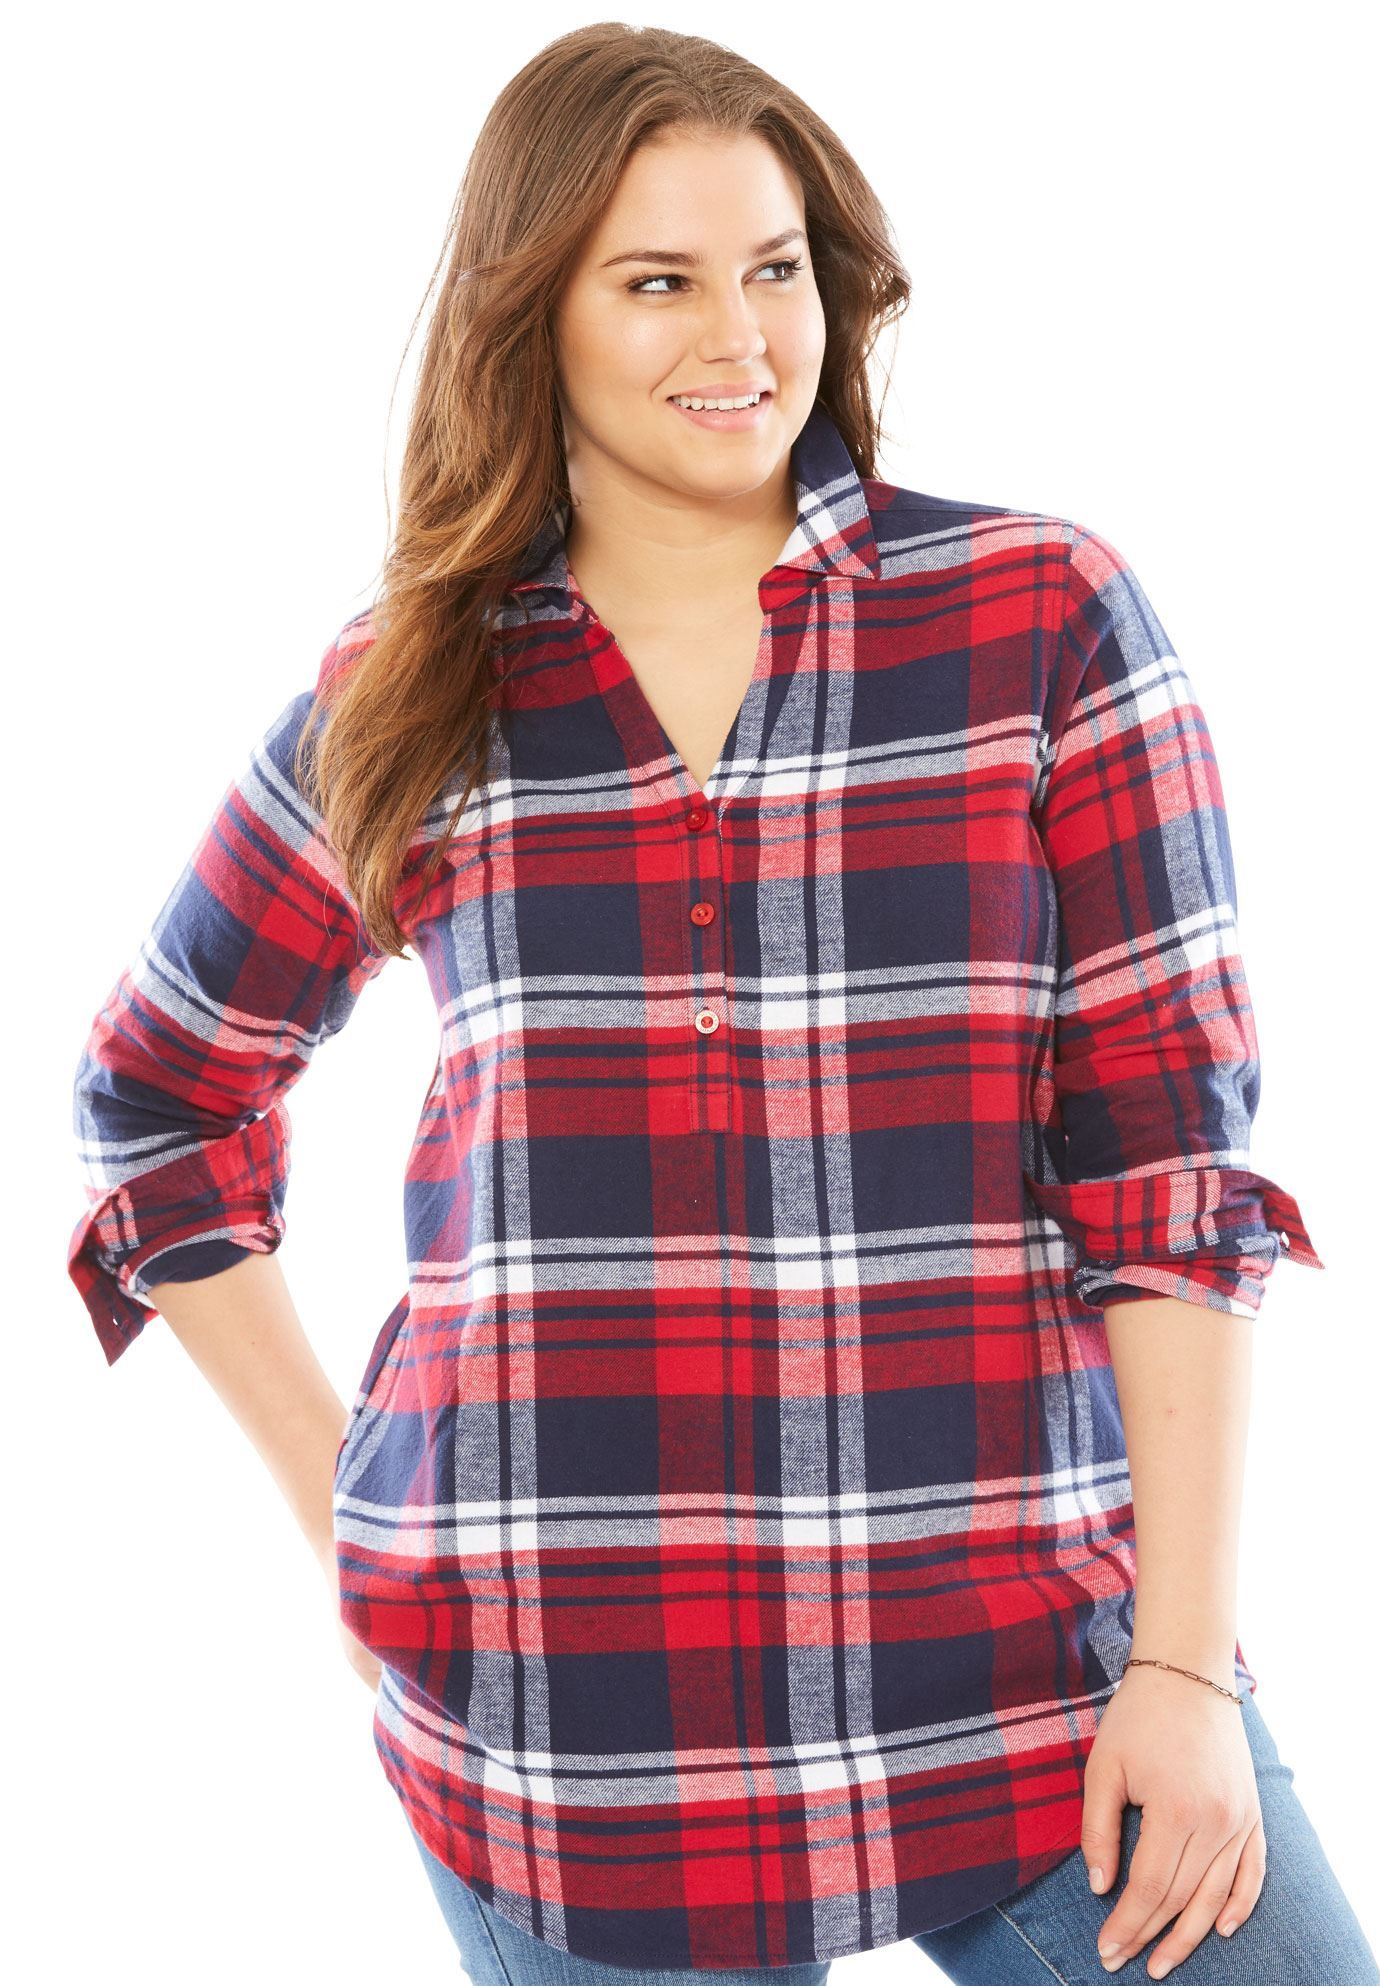 Long sleeve flannel shirt - Women s Plus Size Clothing   wish list ... 33cc4db9aec4